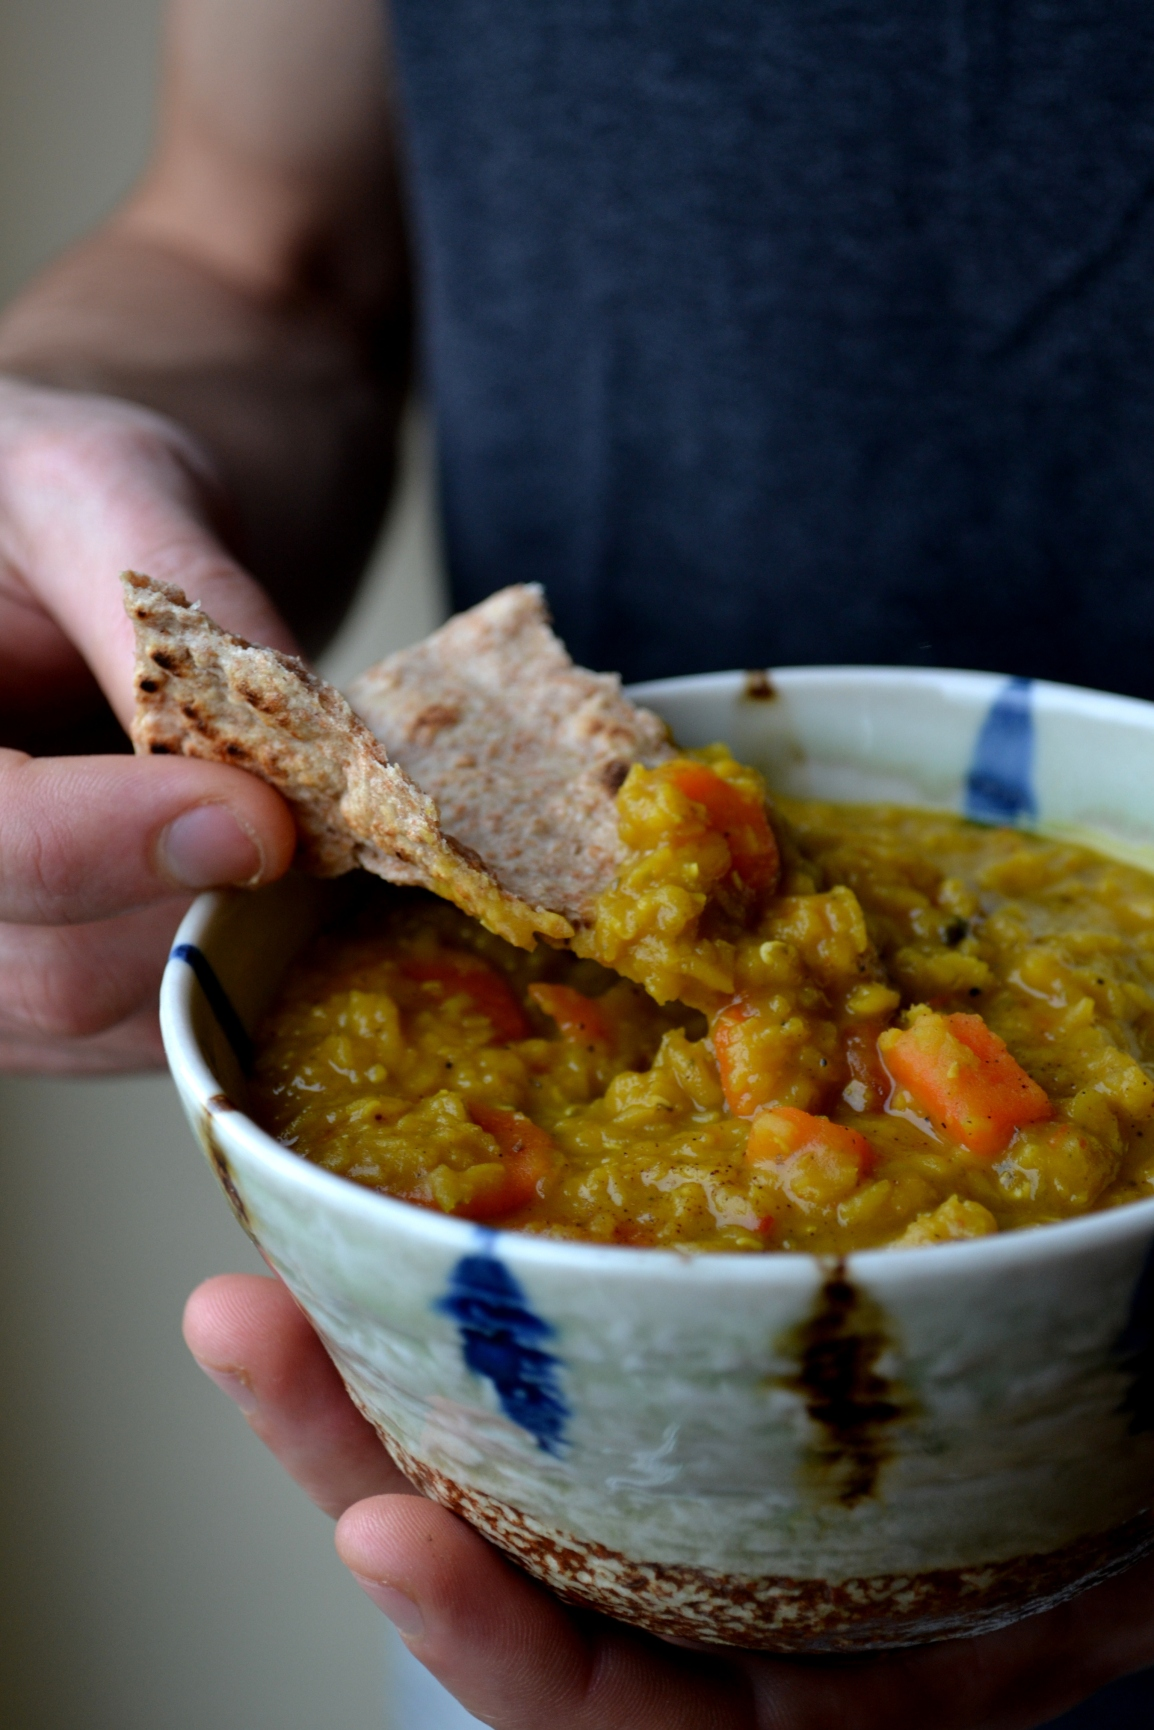 Lentil and CarrotsDahl